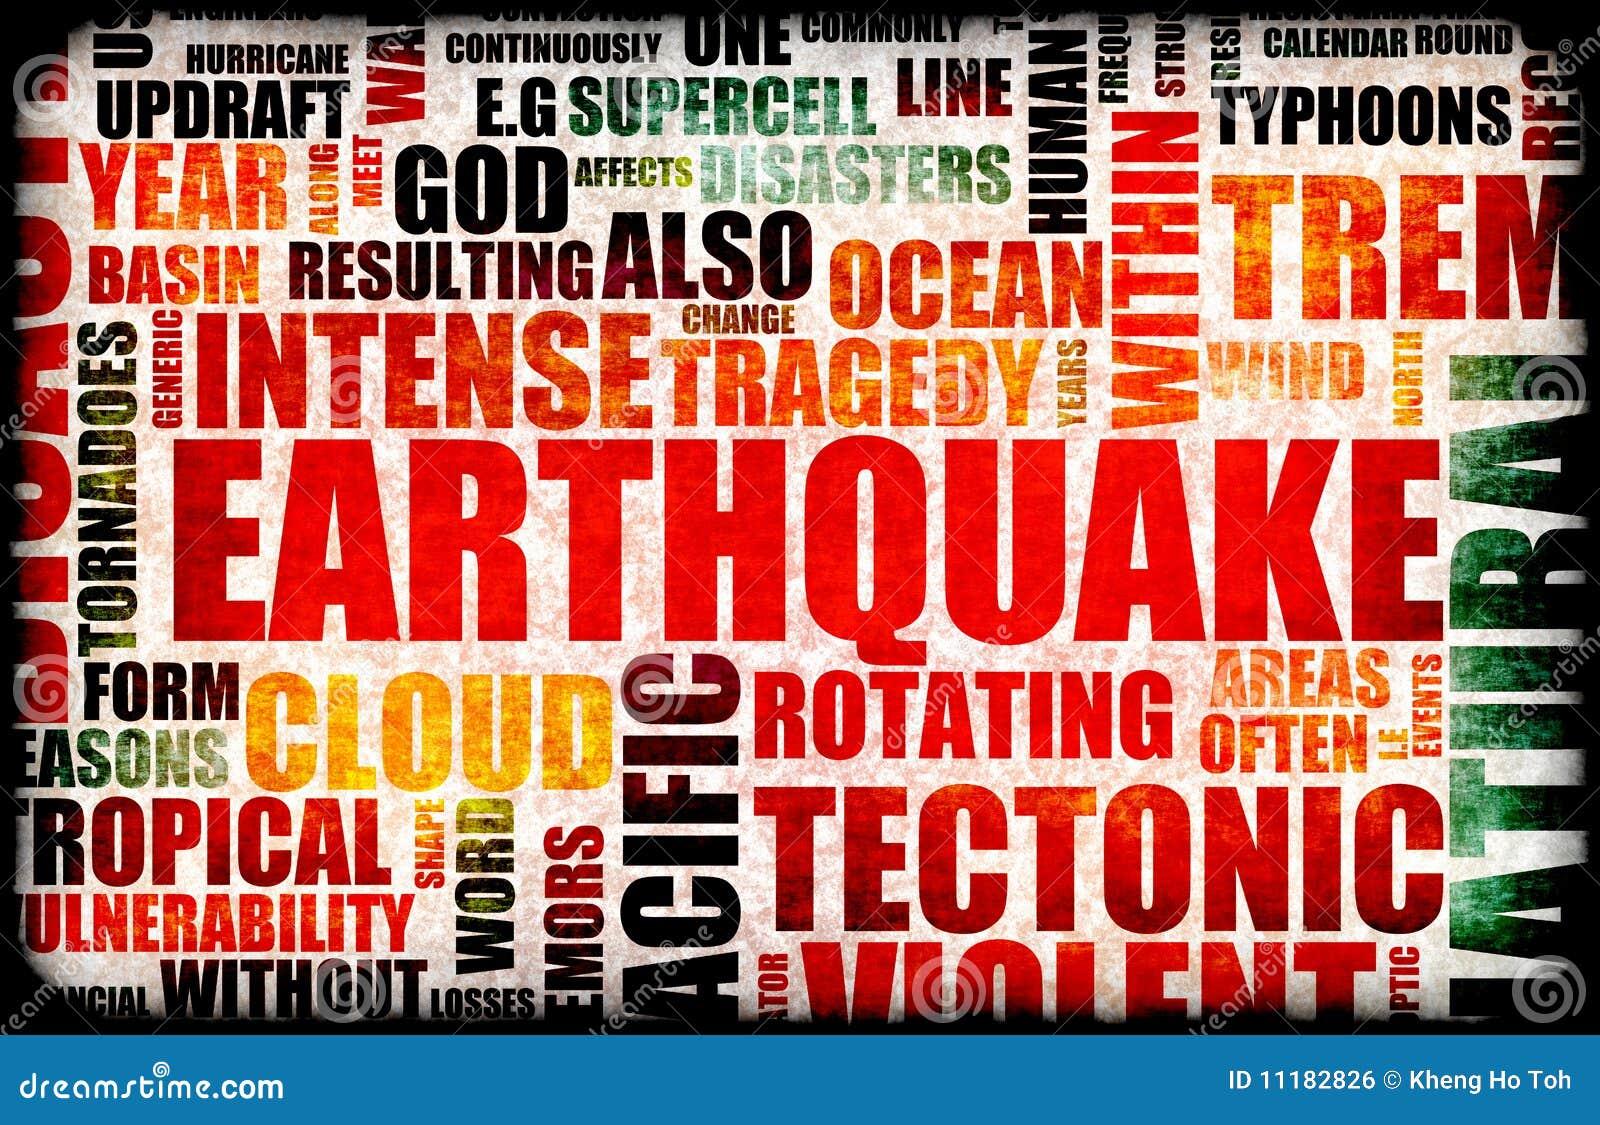 Earthquake Royalty Free Stock Image - Image: 11182826